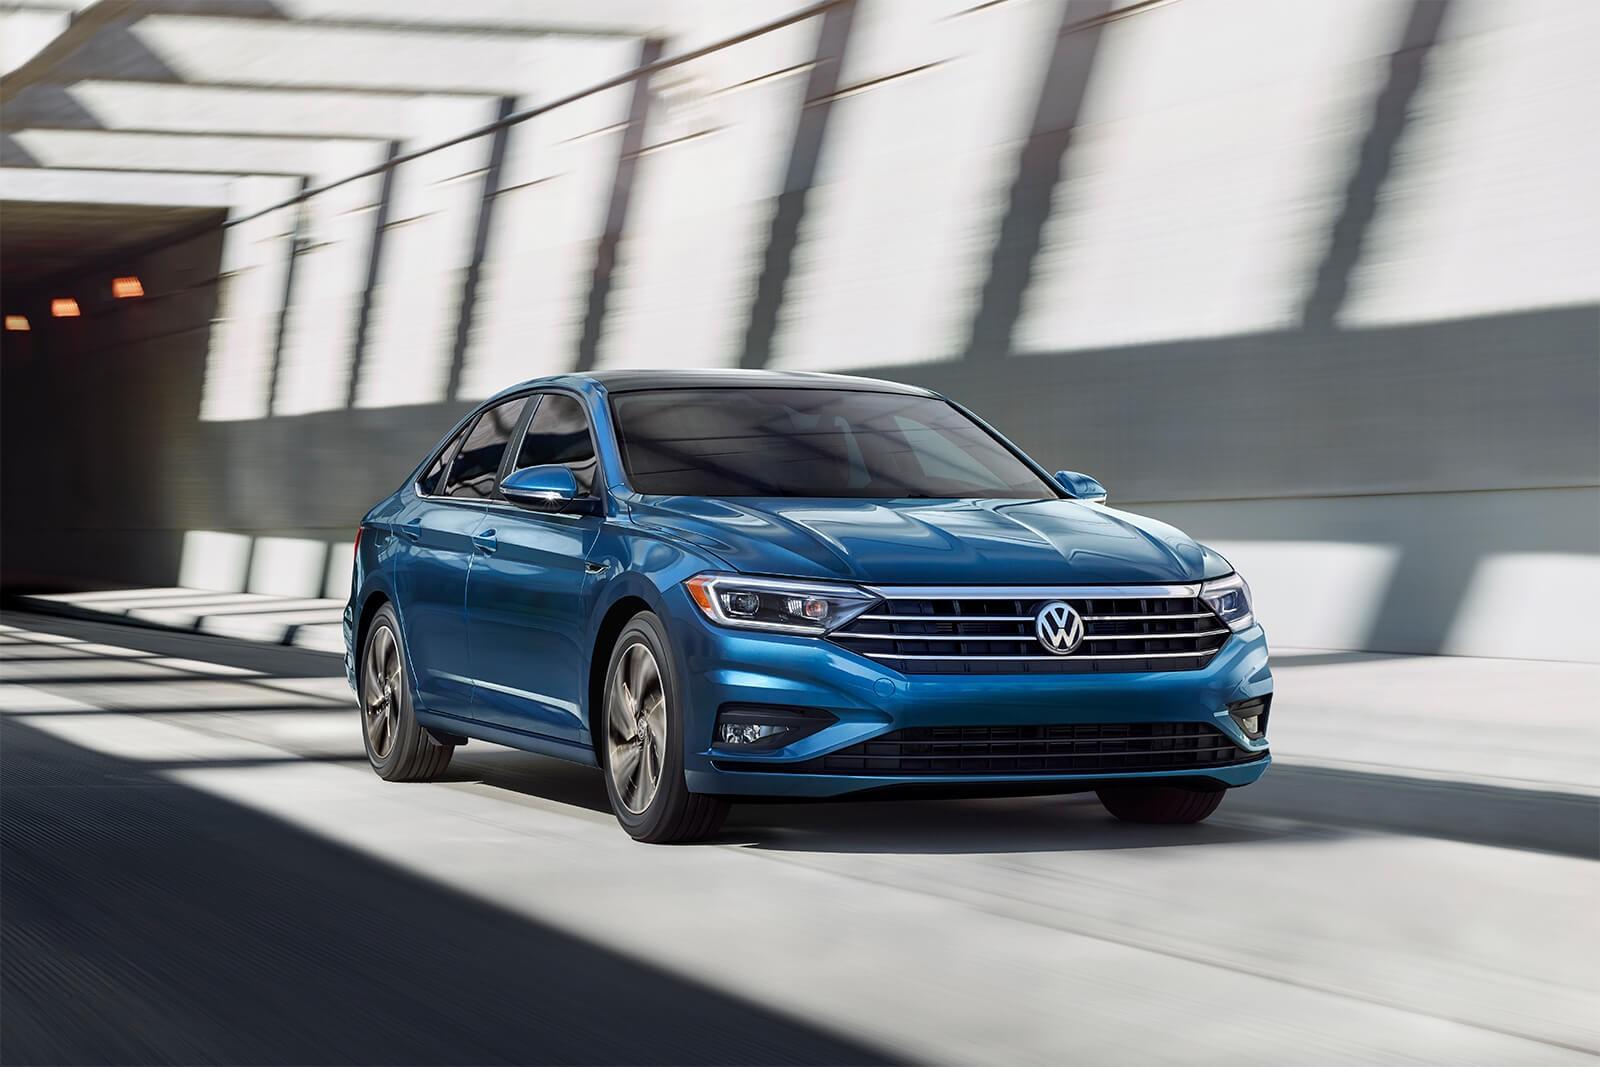 Volkswagen Jetta 2019 a la venta cerca de Clinton, MD